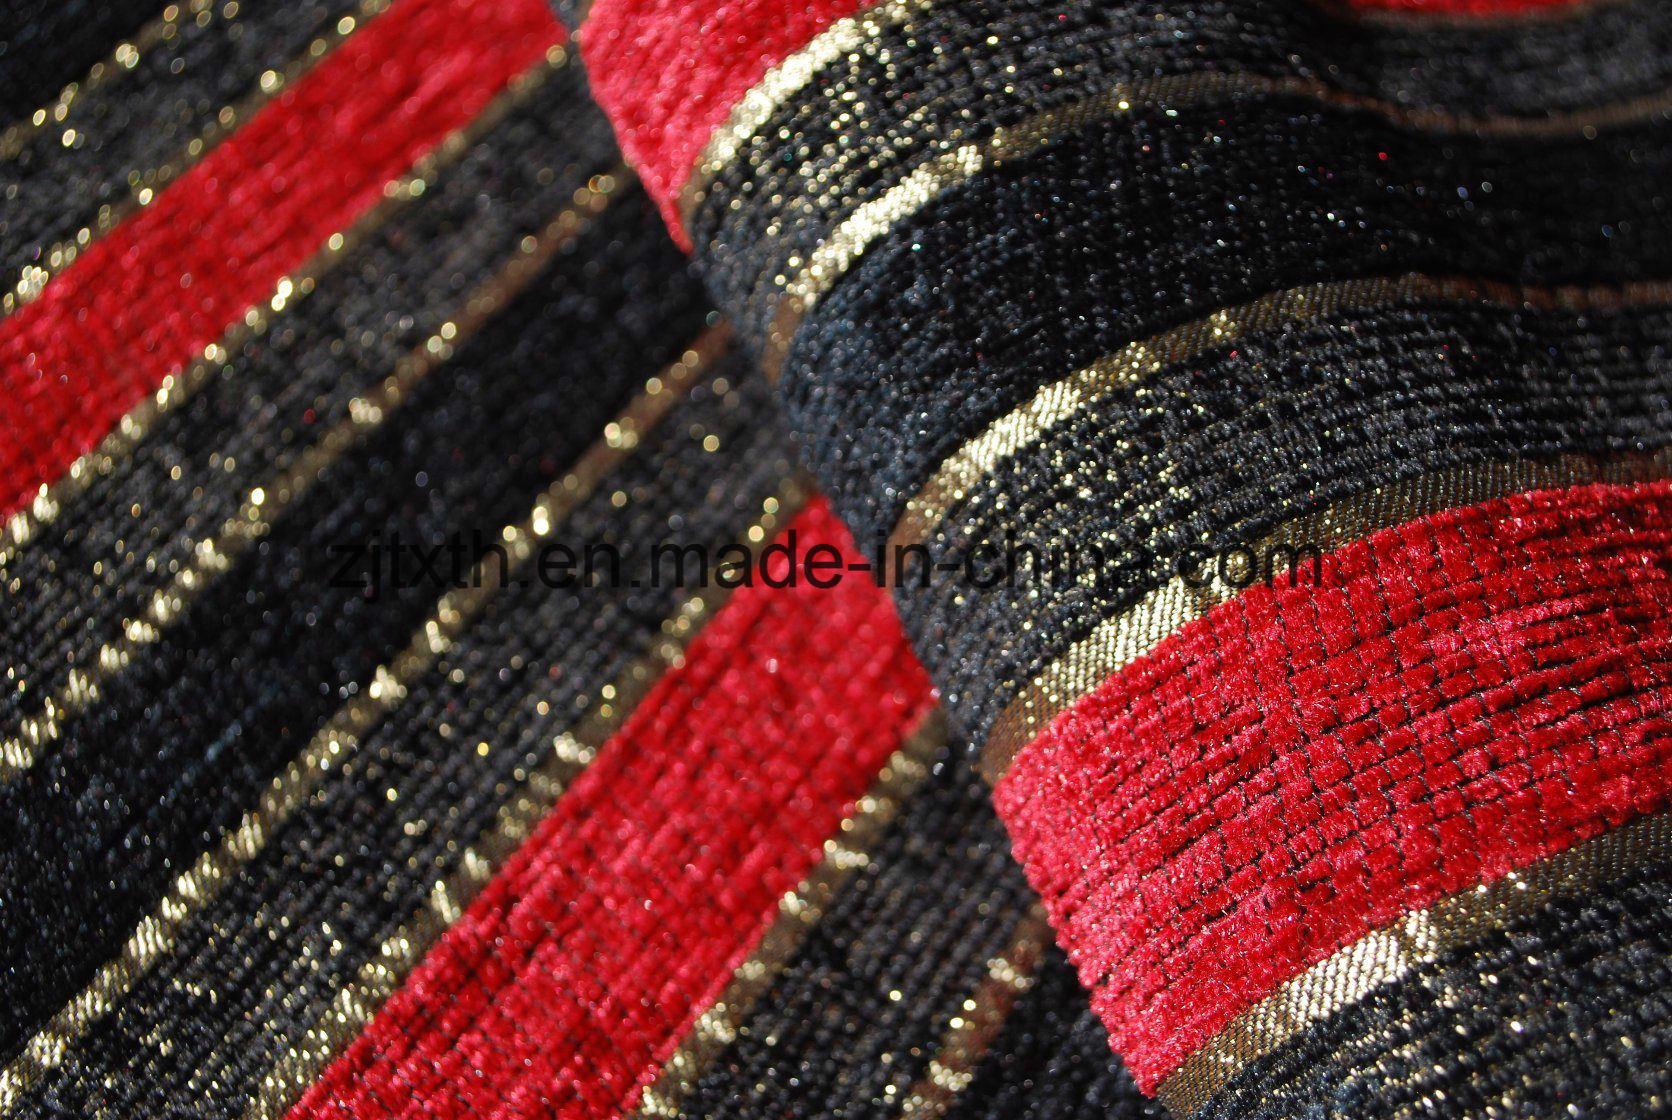 [Hot Item] Stripe Design Black and Red Chenille Sofa Fabric (FTH31003B)